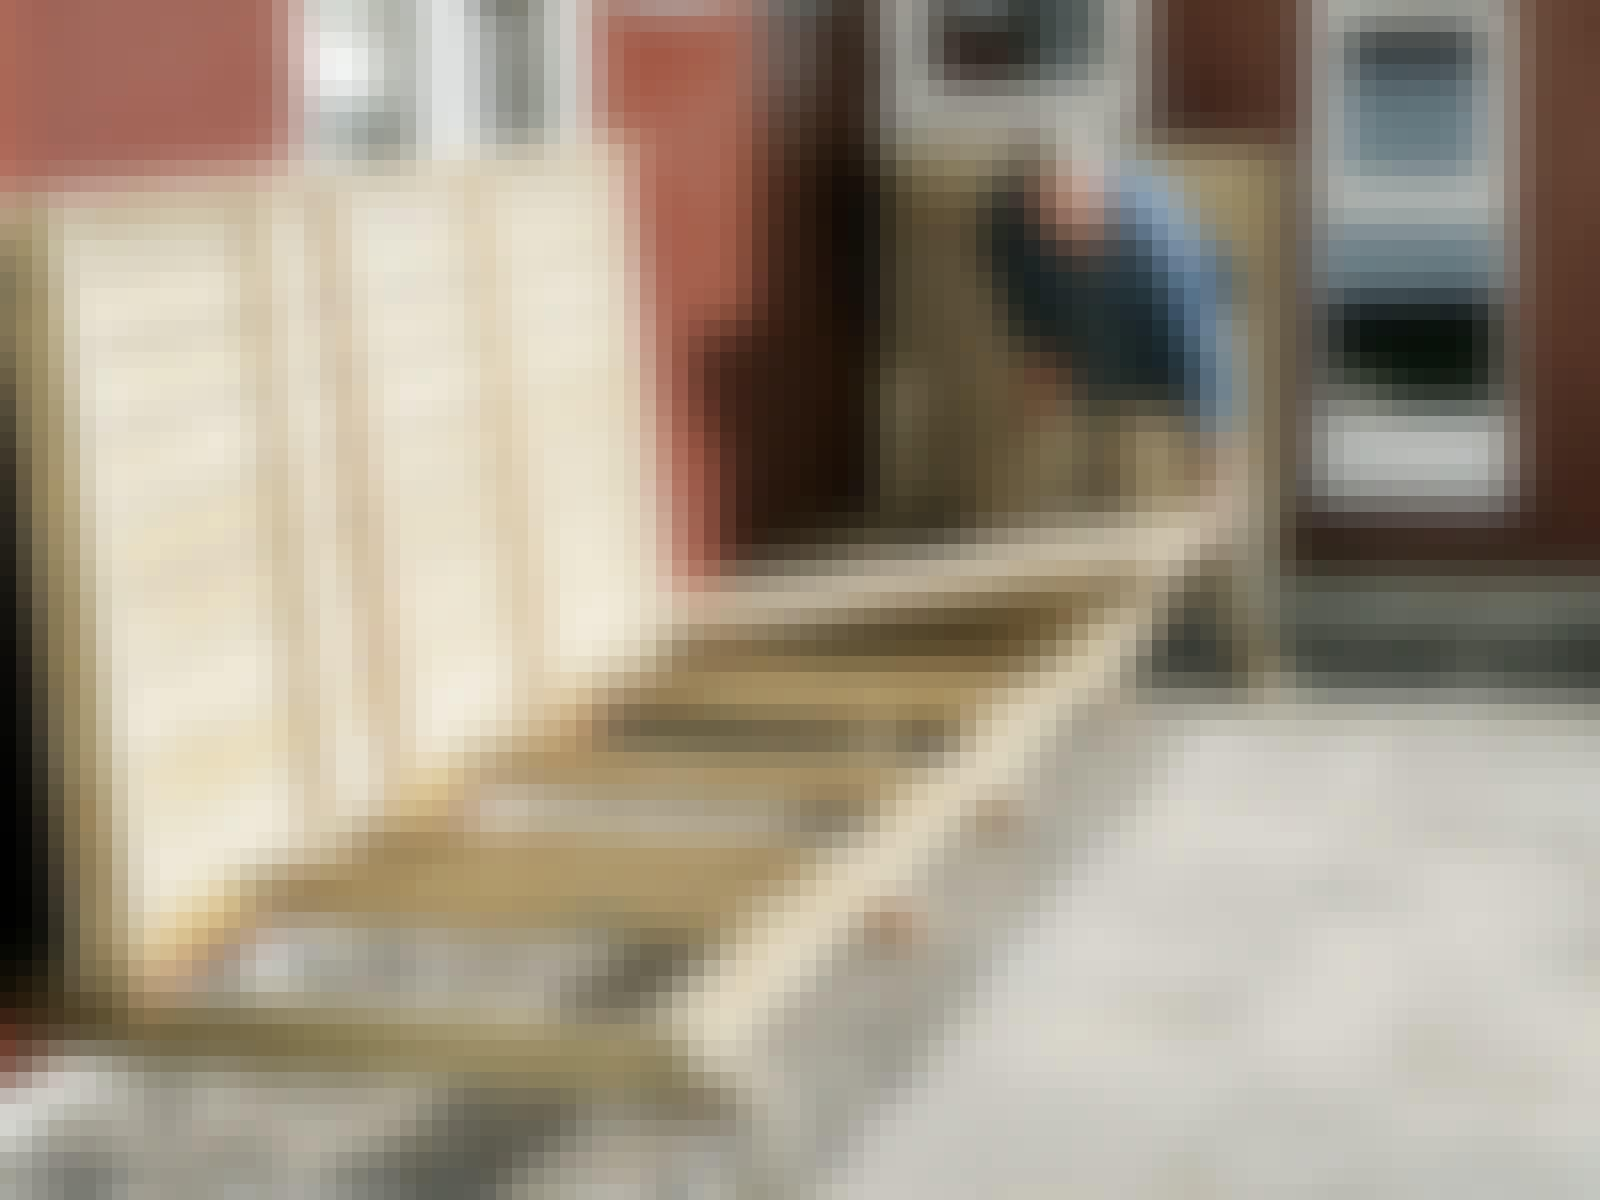 Terrasse fliser klap op